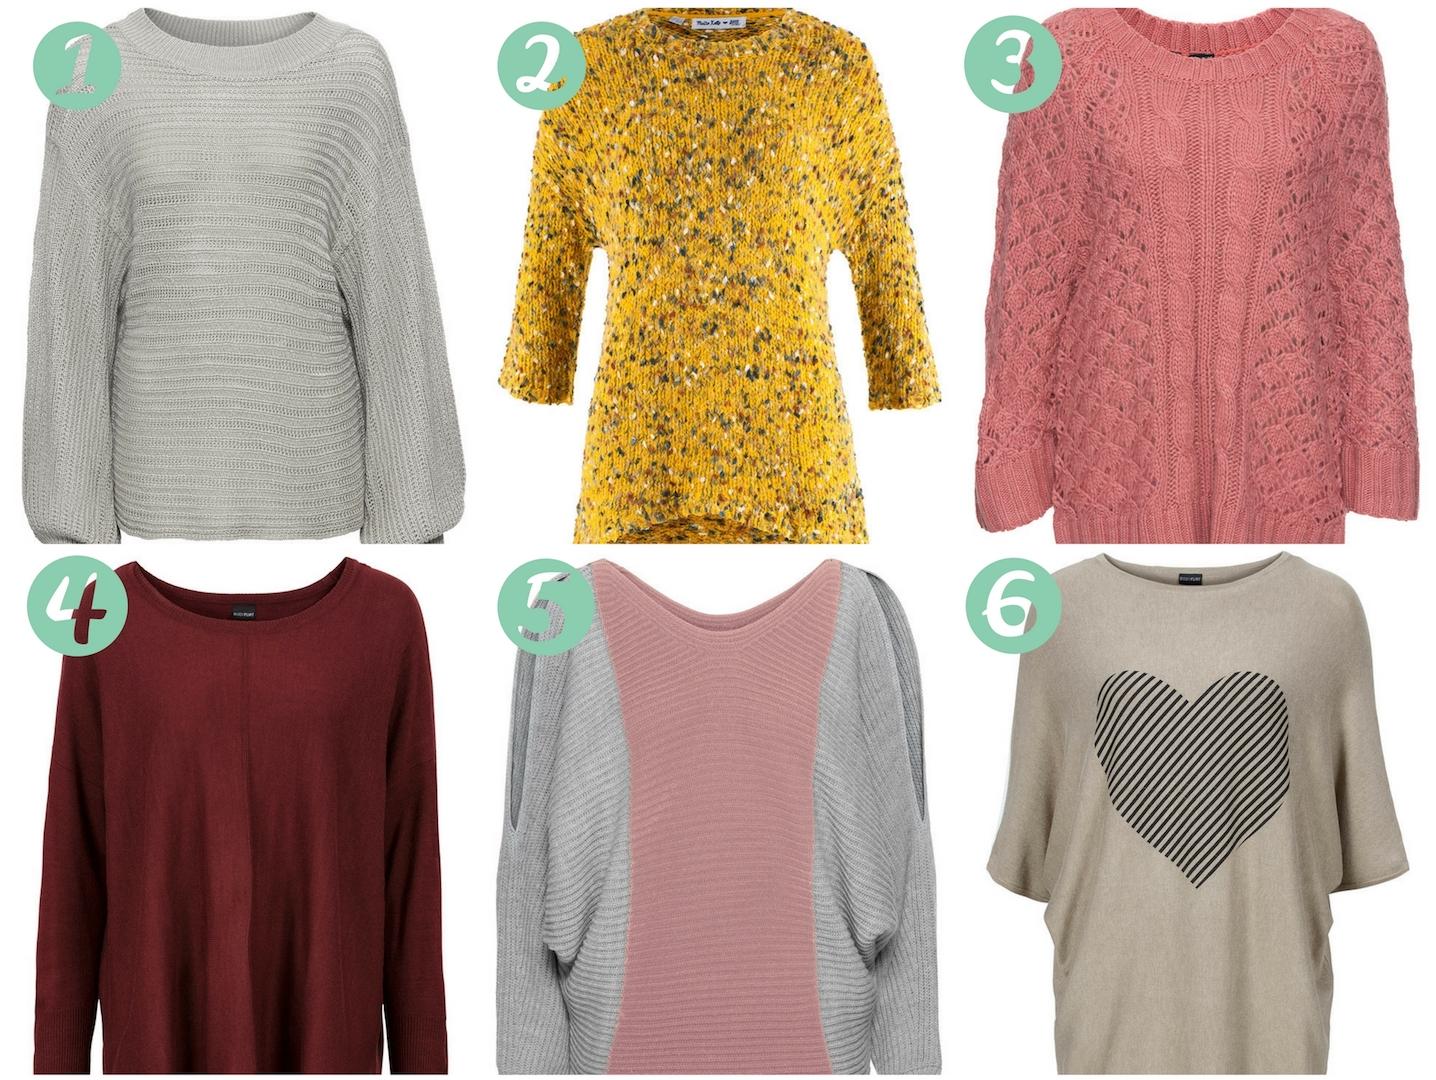 sweter oversize damski - jaki wybrać